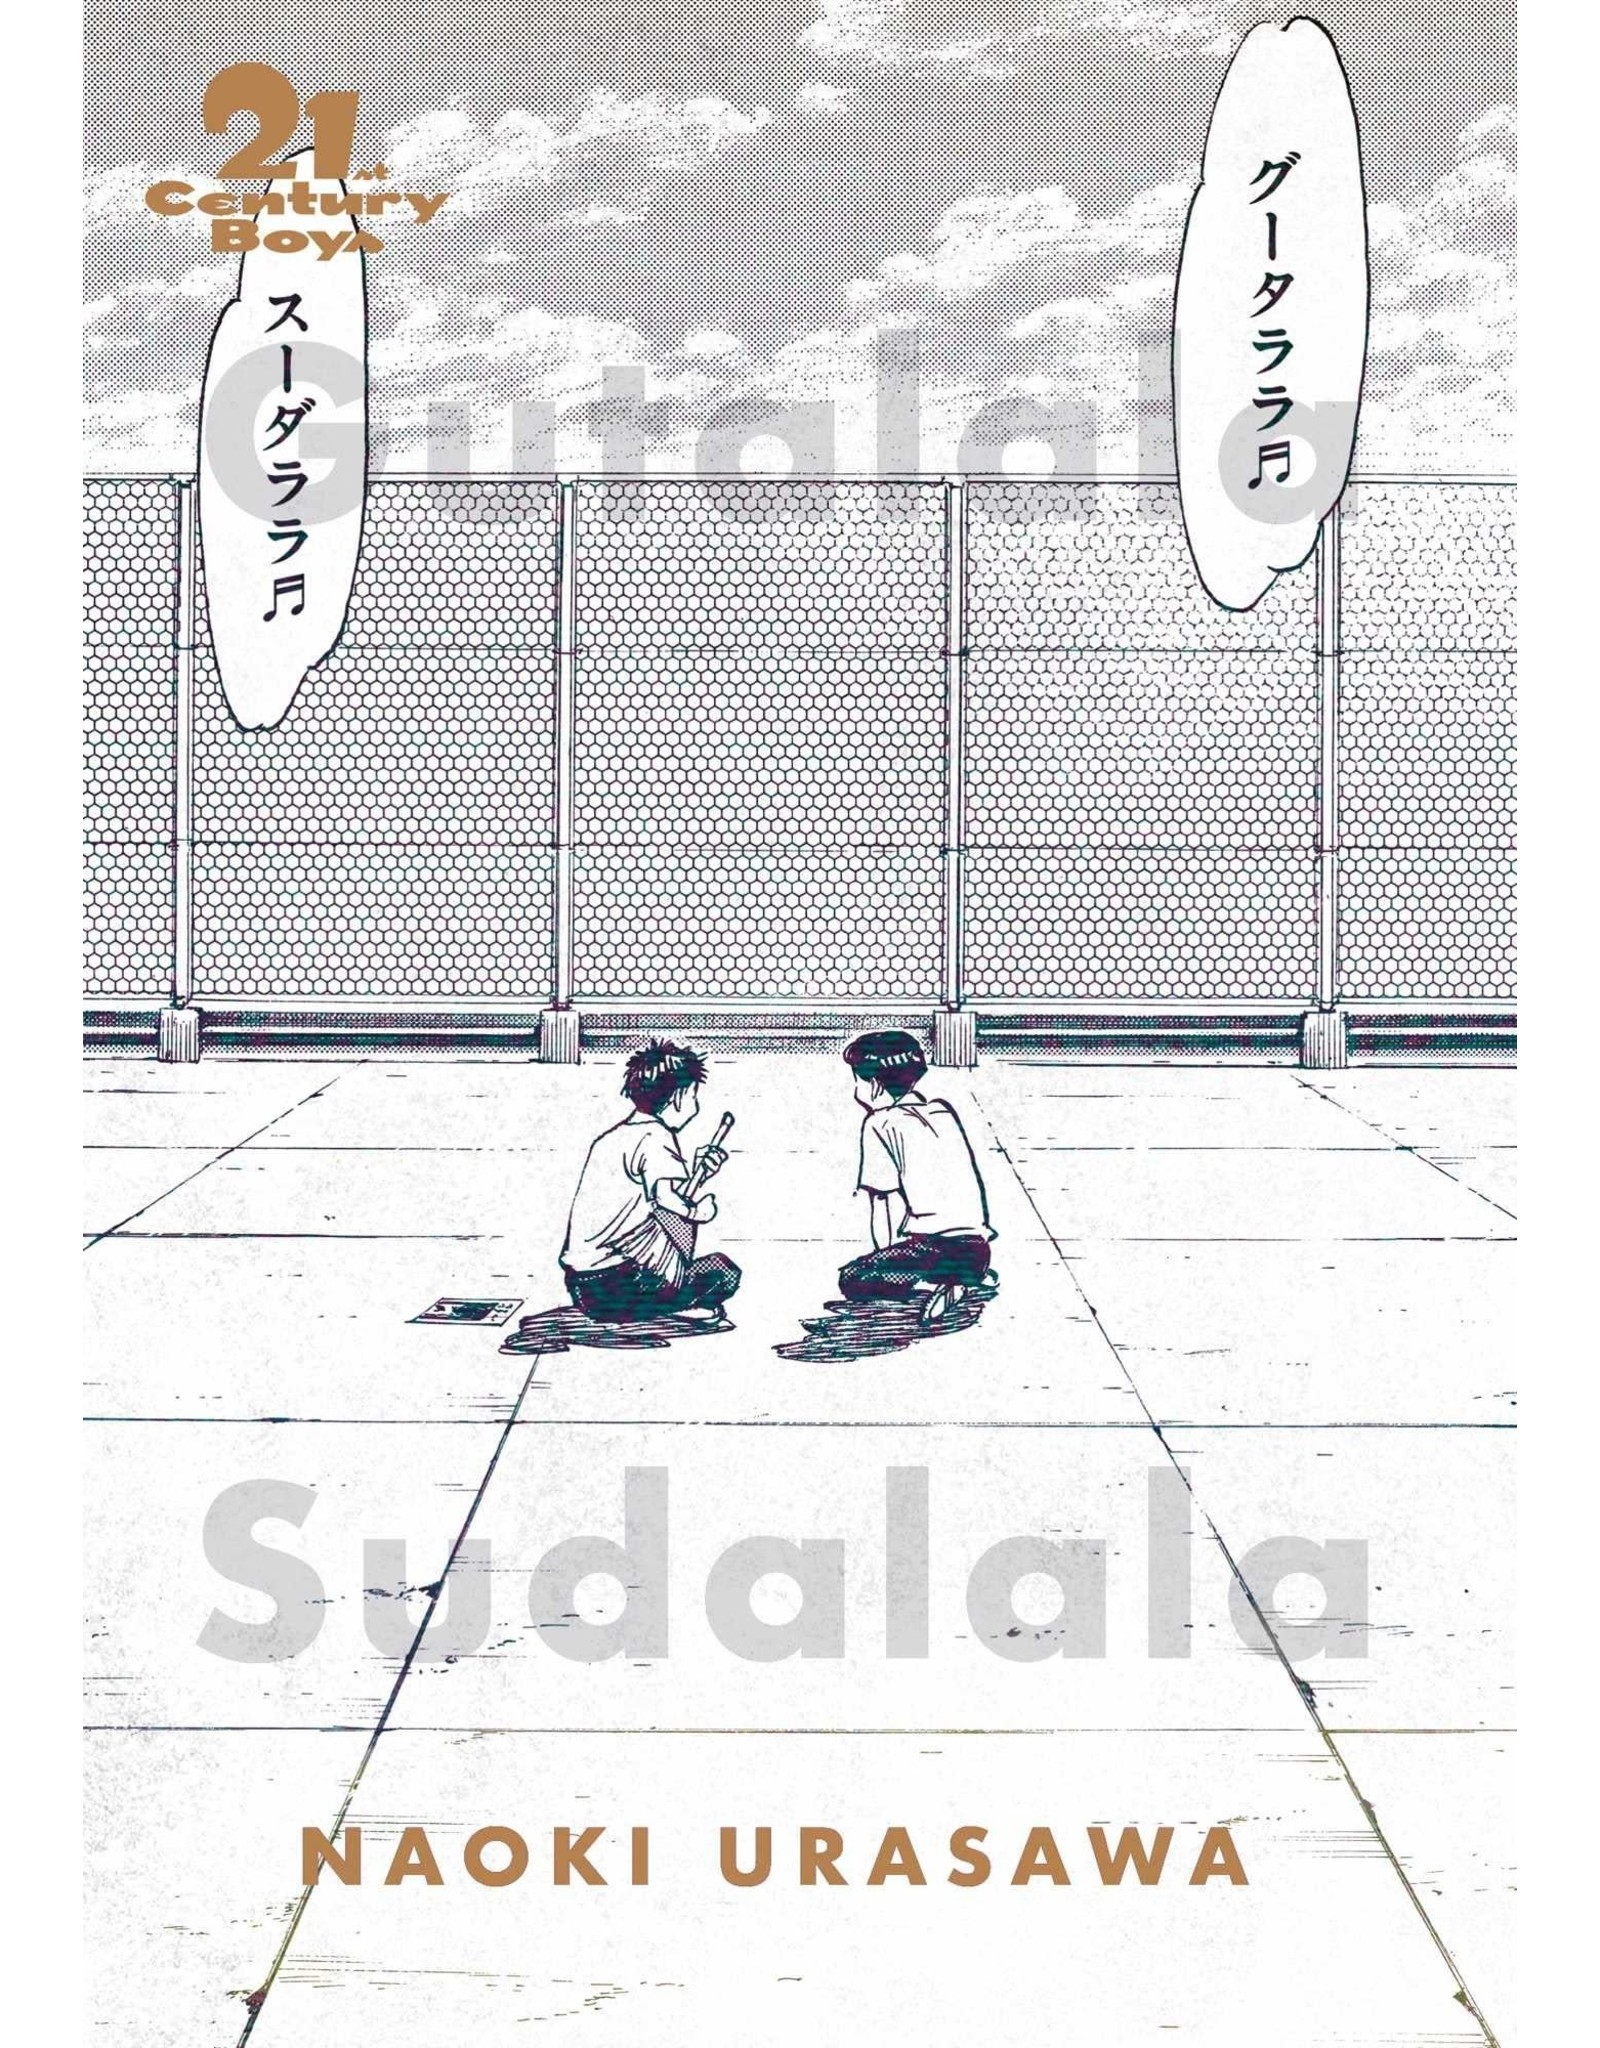 21st Century Boys: The Perfect Edition (Engelstalig) - Manga